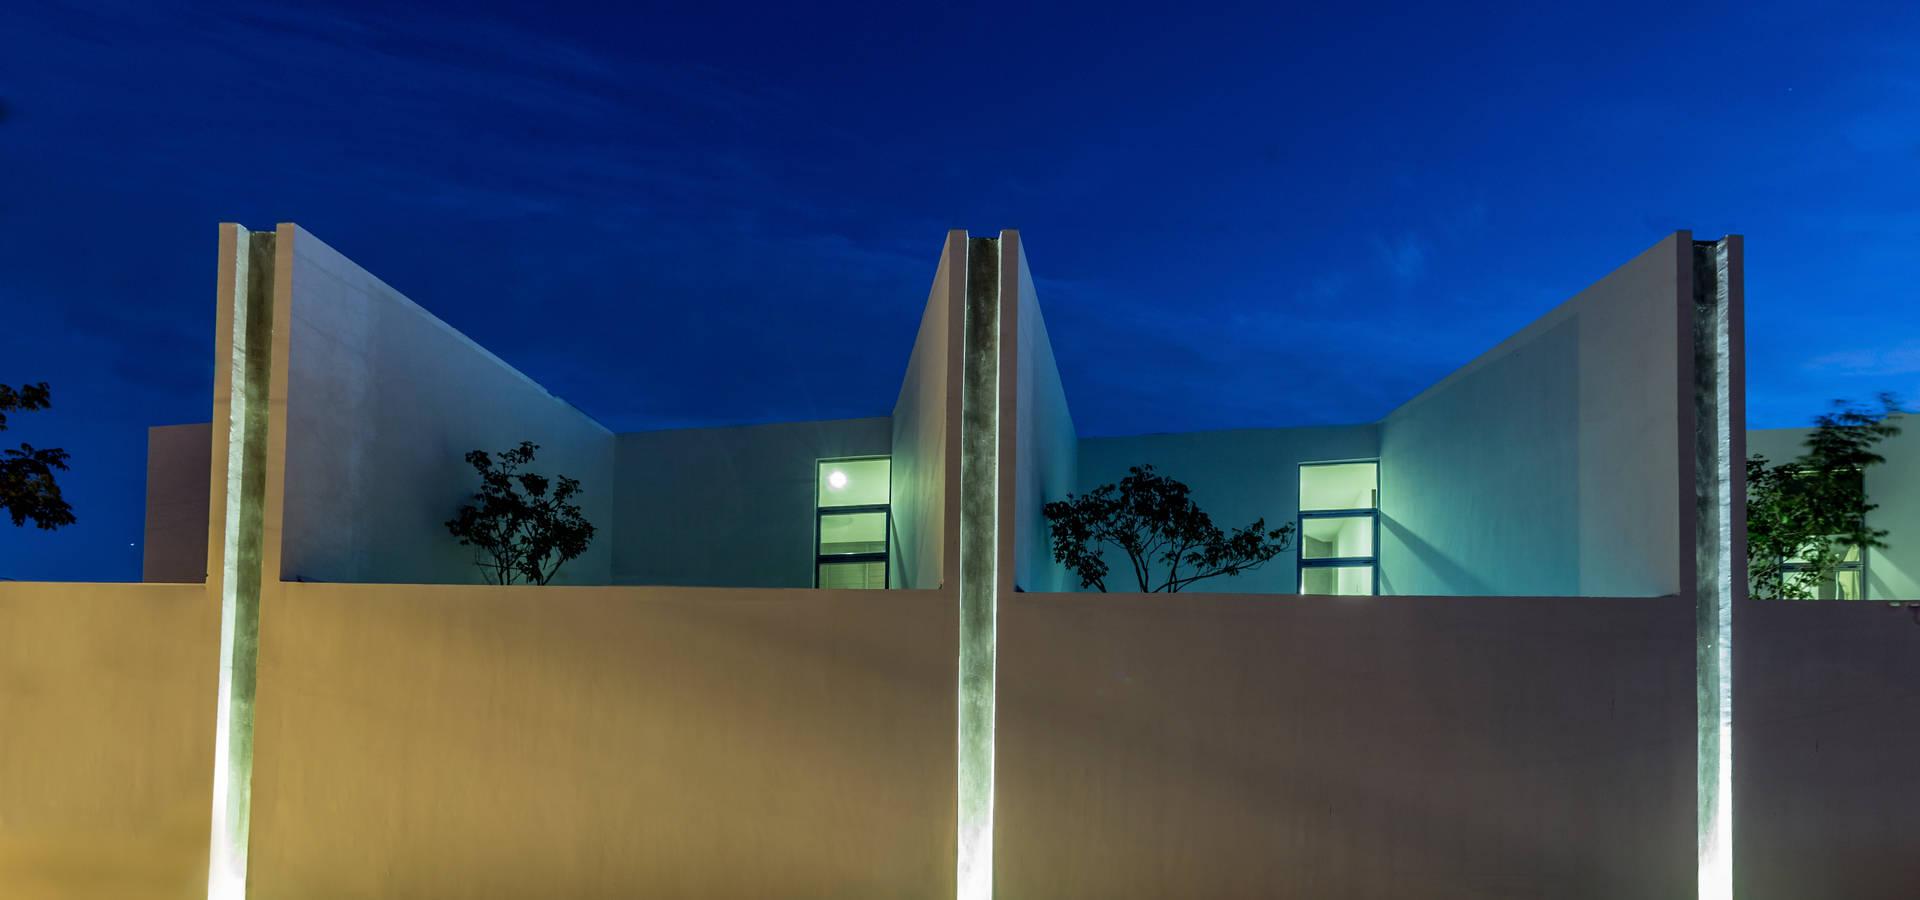 Grupo arquidecture arquitectos en m rida yucat n m xico - Arquitectos en merida ...